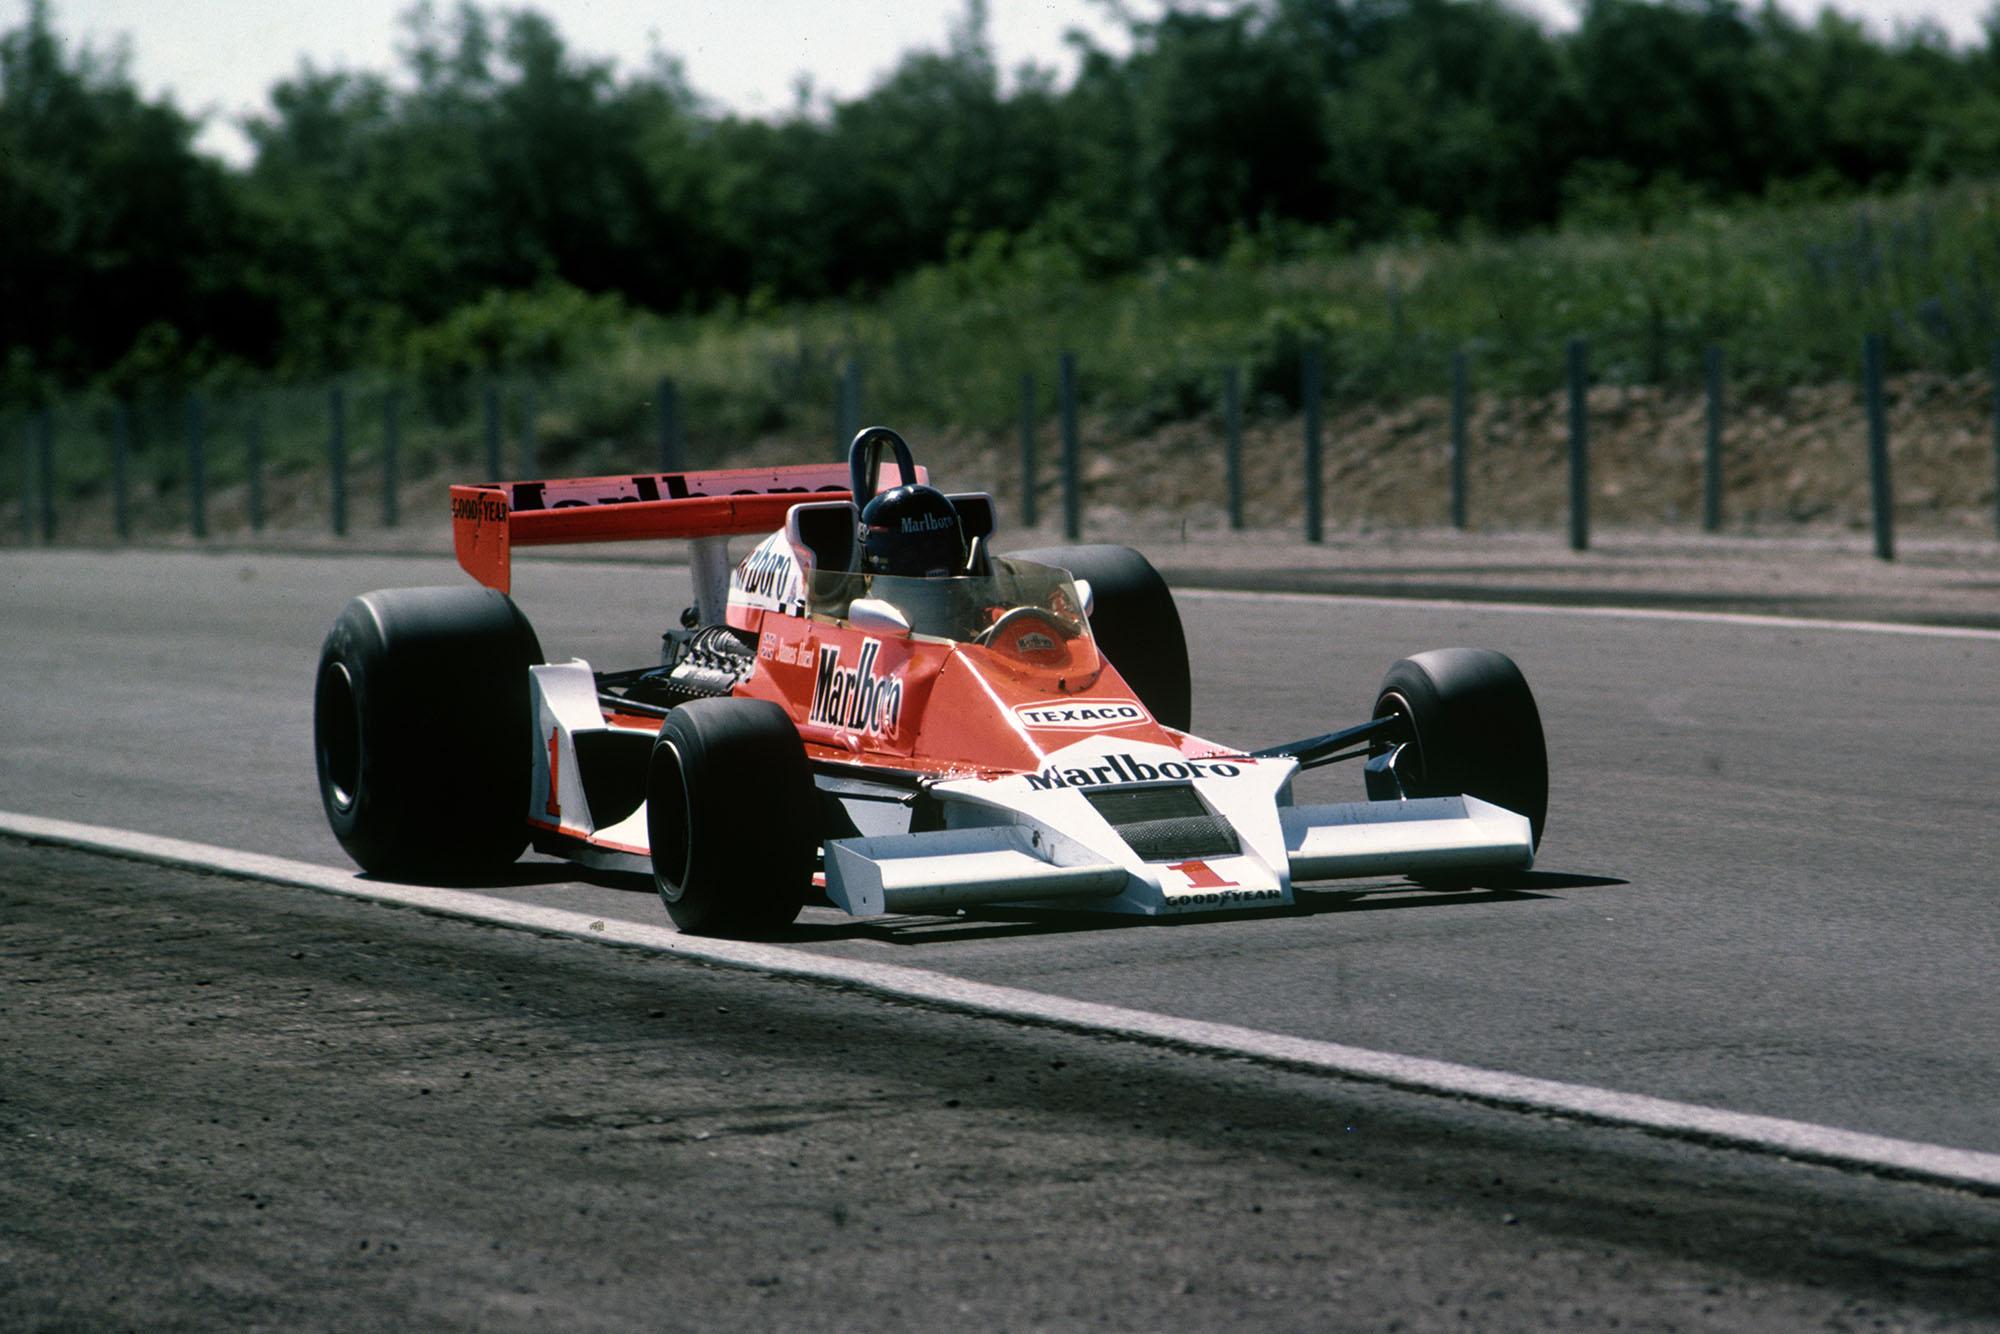 James Hunt (McLaren) at the 1977 French Grand Prix, Dijon.